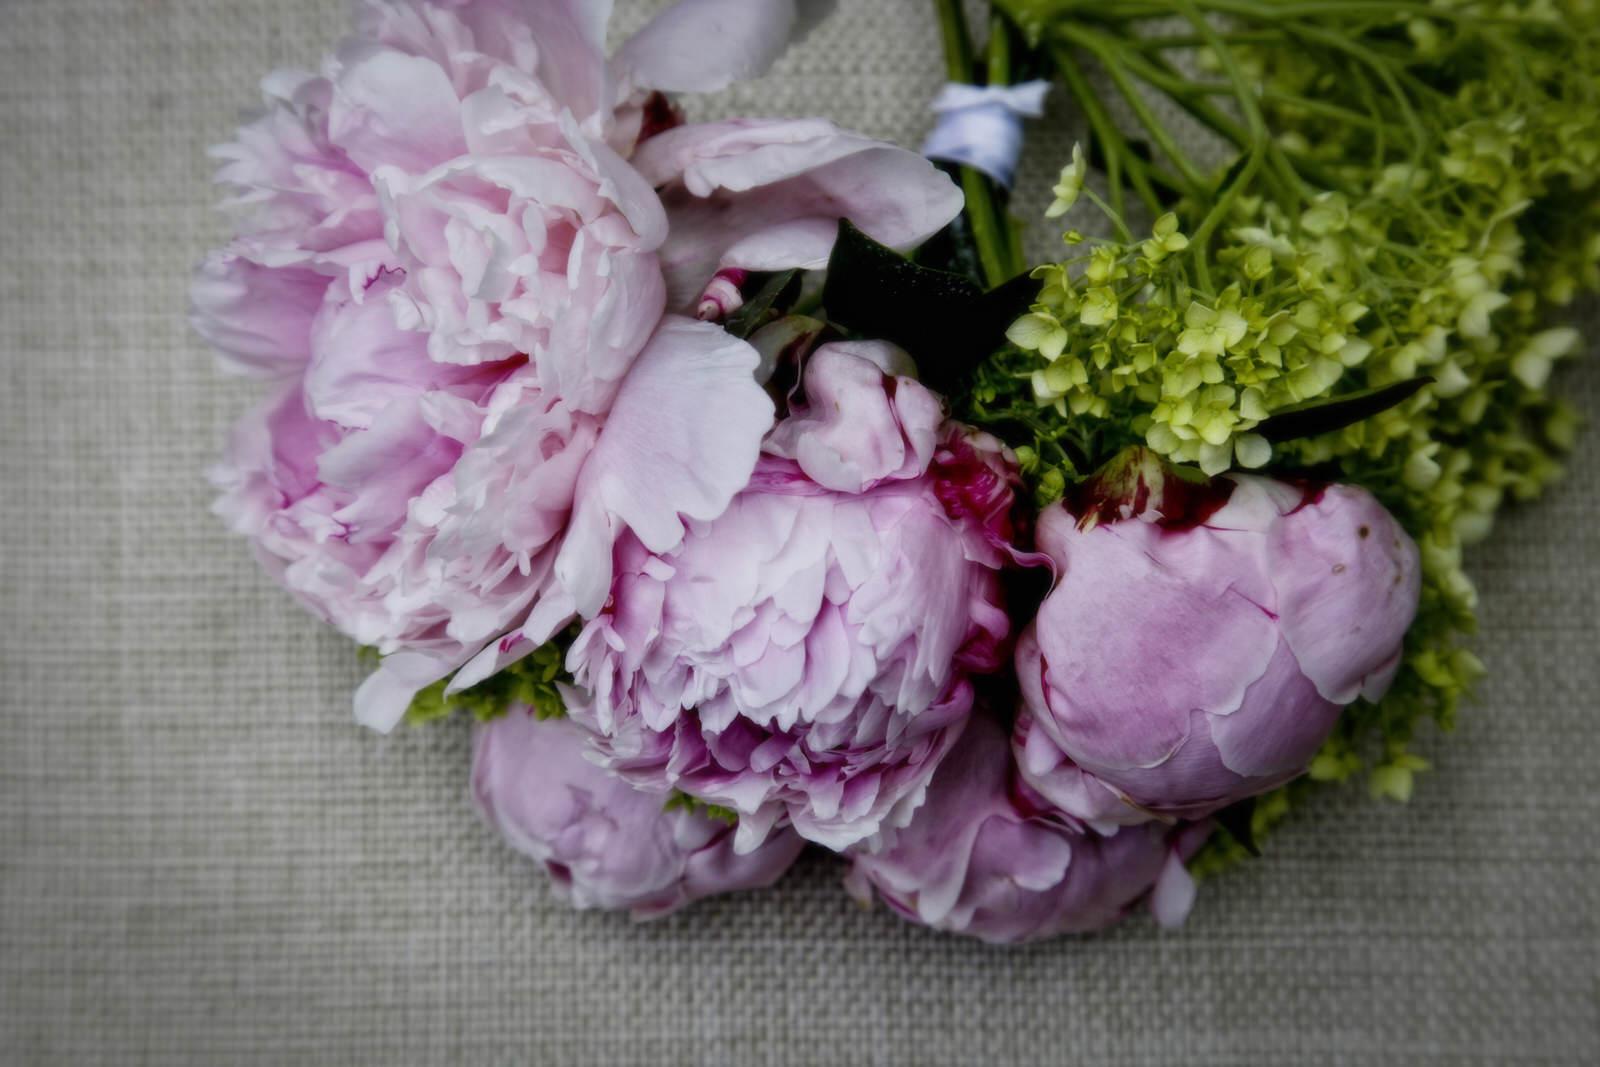 tuscany-wedding-planners-floristen-45.JPG